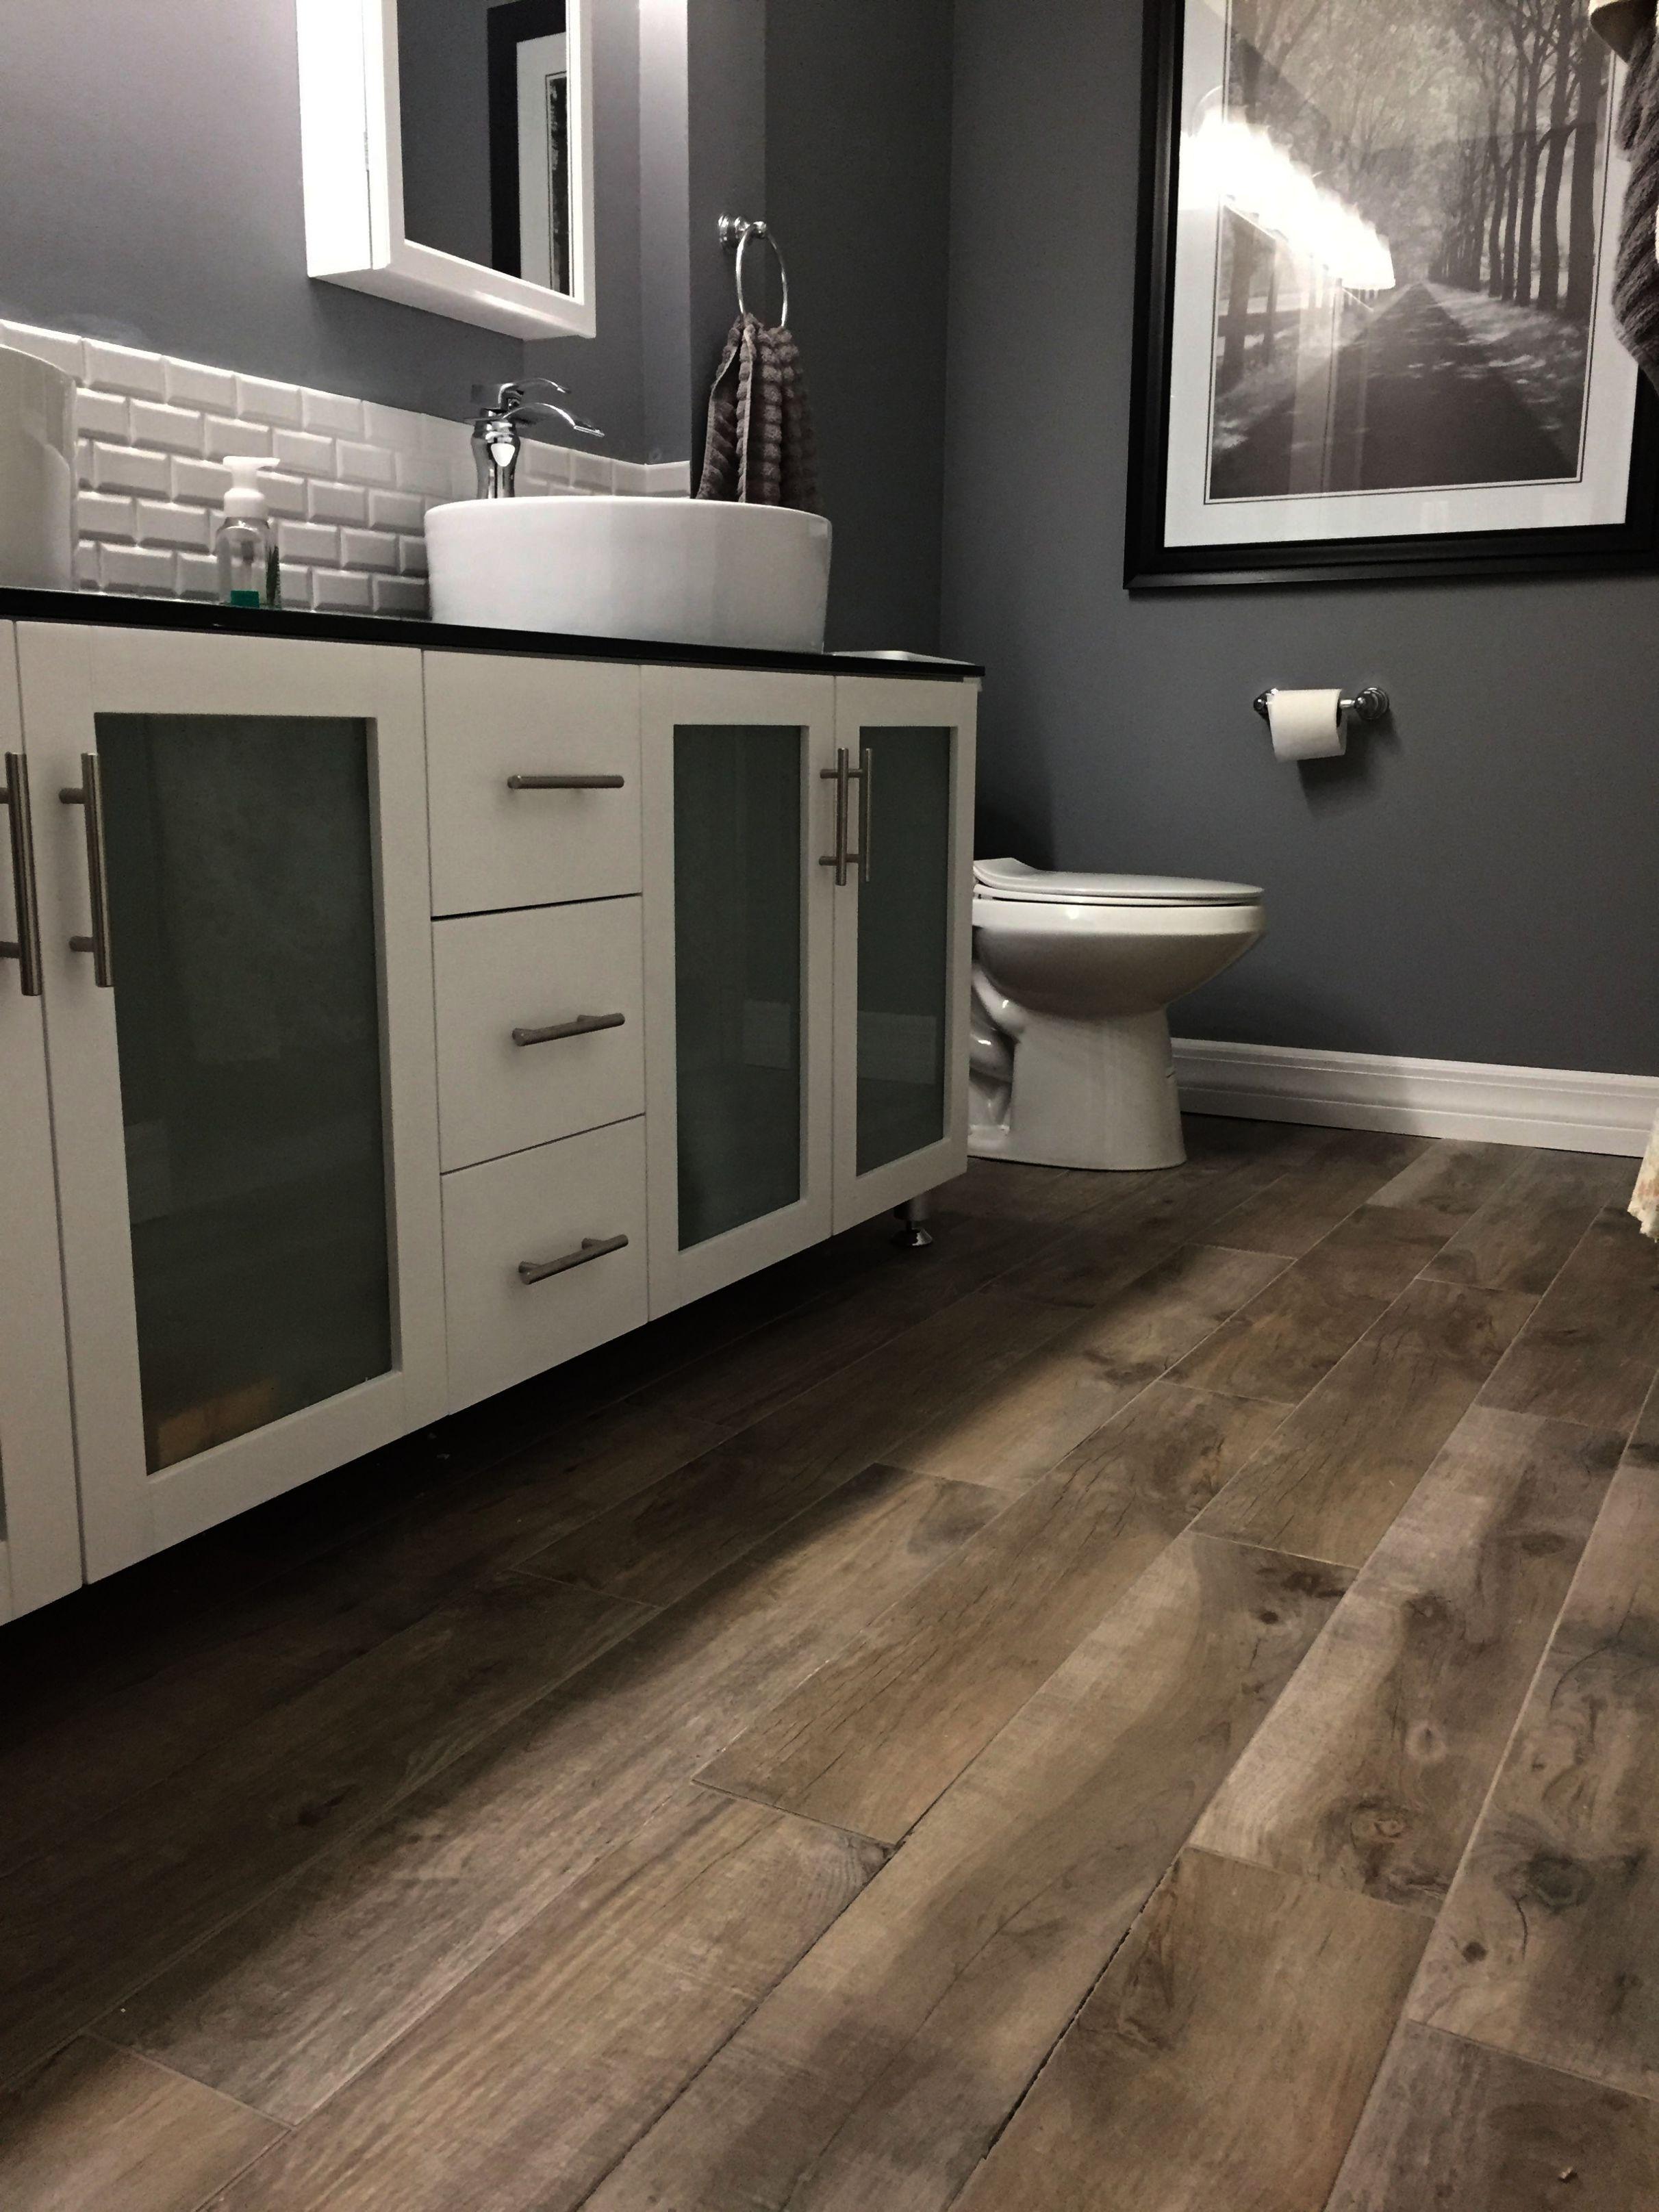 Pin on Rustic Look Bathrooms